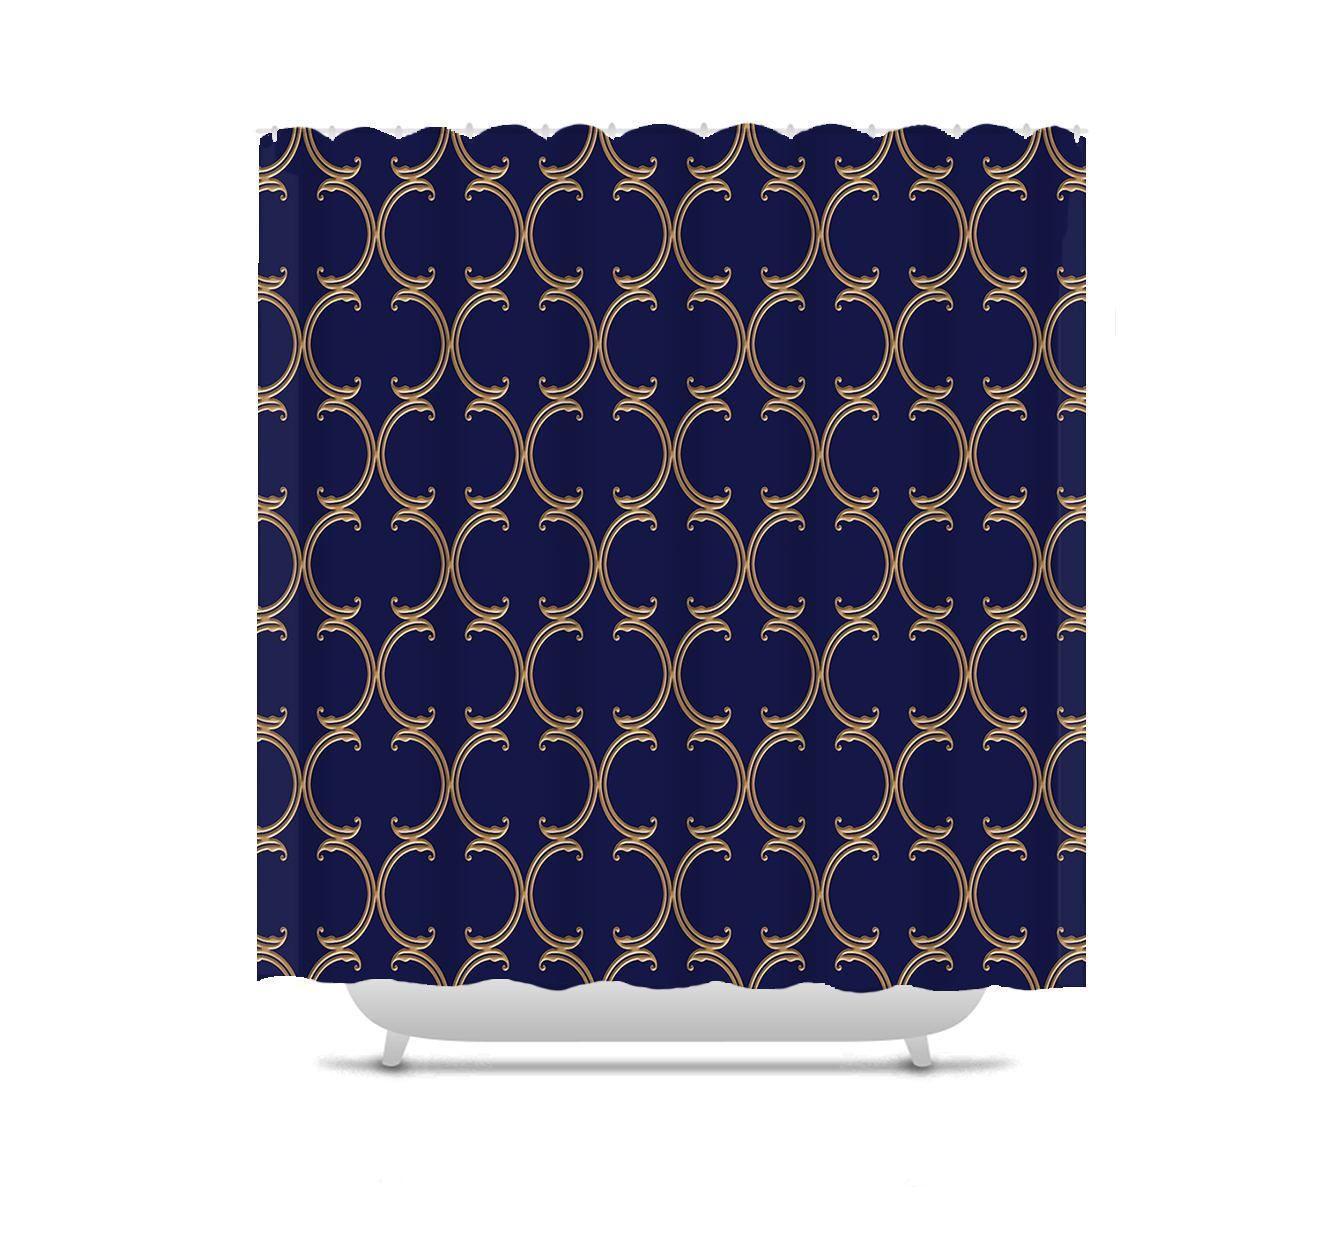 Moroccan Shower Curtain, faux gold lattice on purple